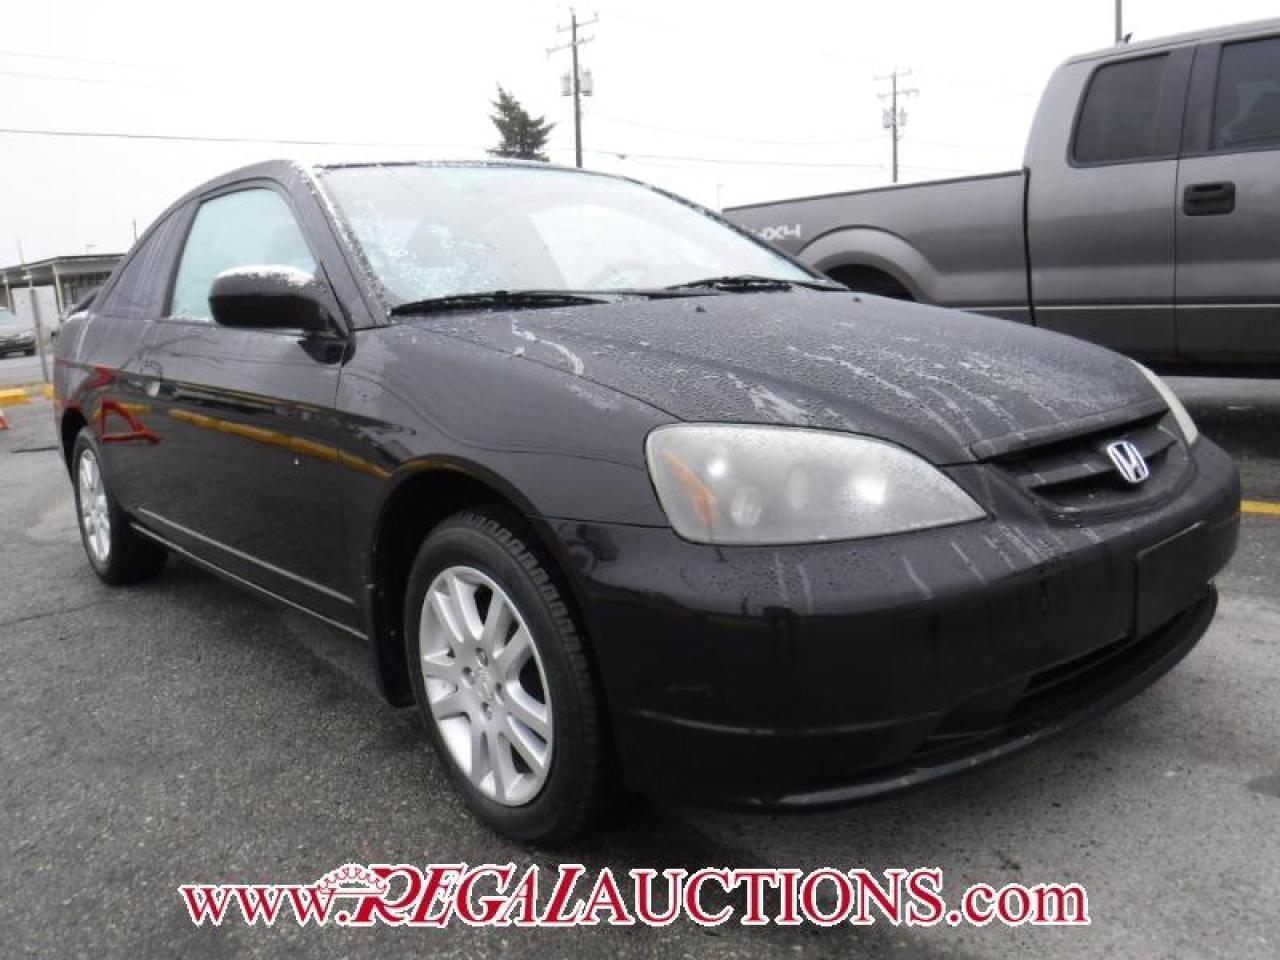 Photo of Black 2003 Honda Civic